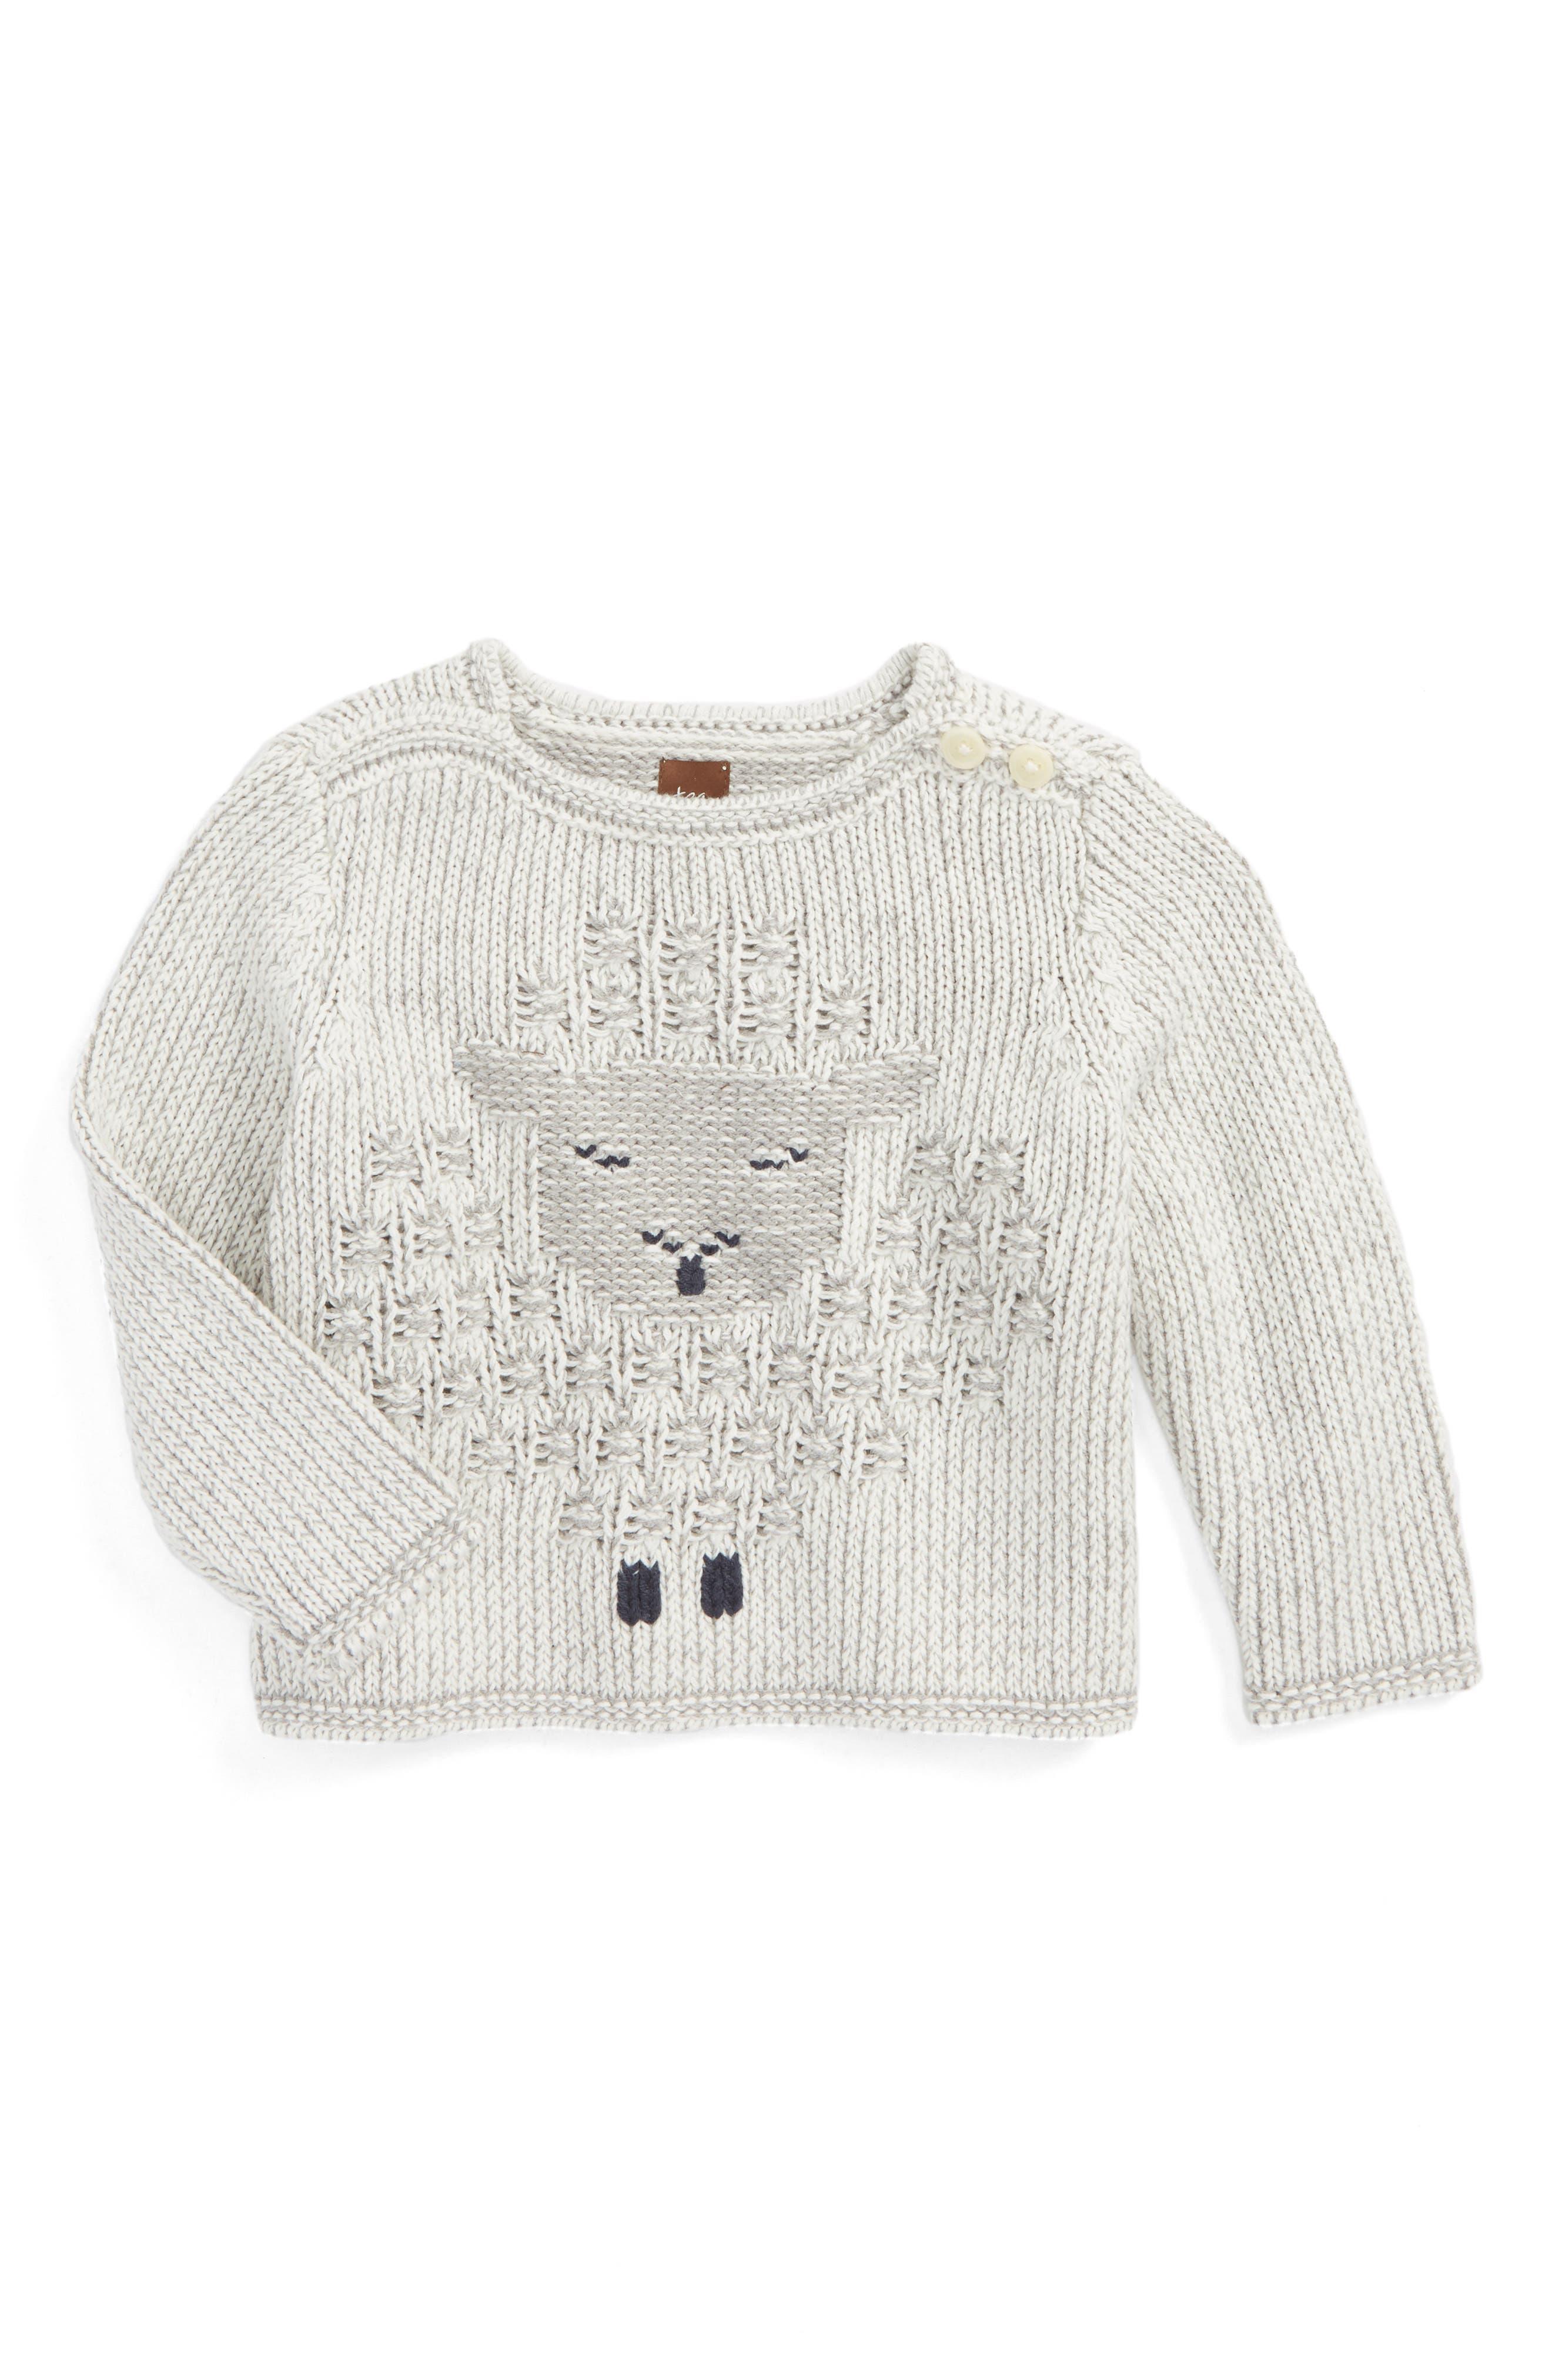 Uan Sweater,                         Main,                         color, Chalk